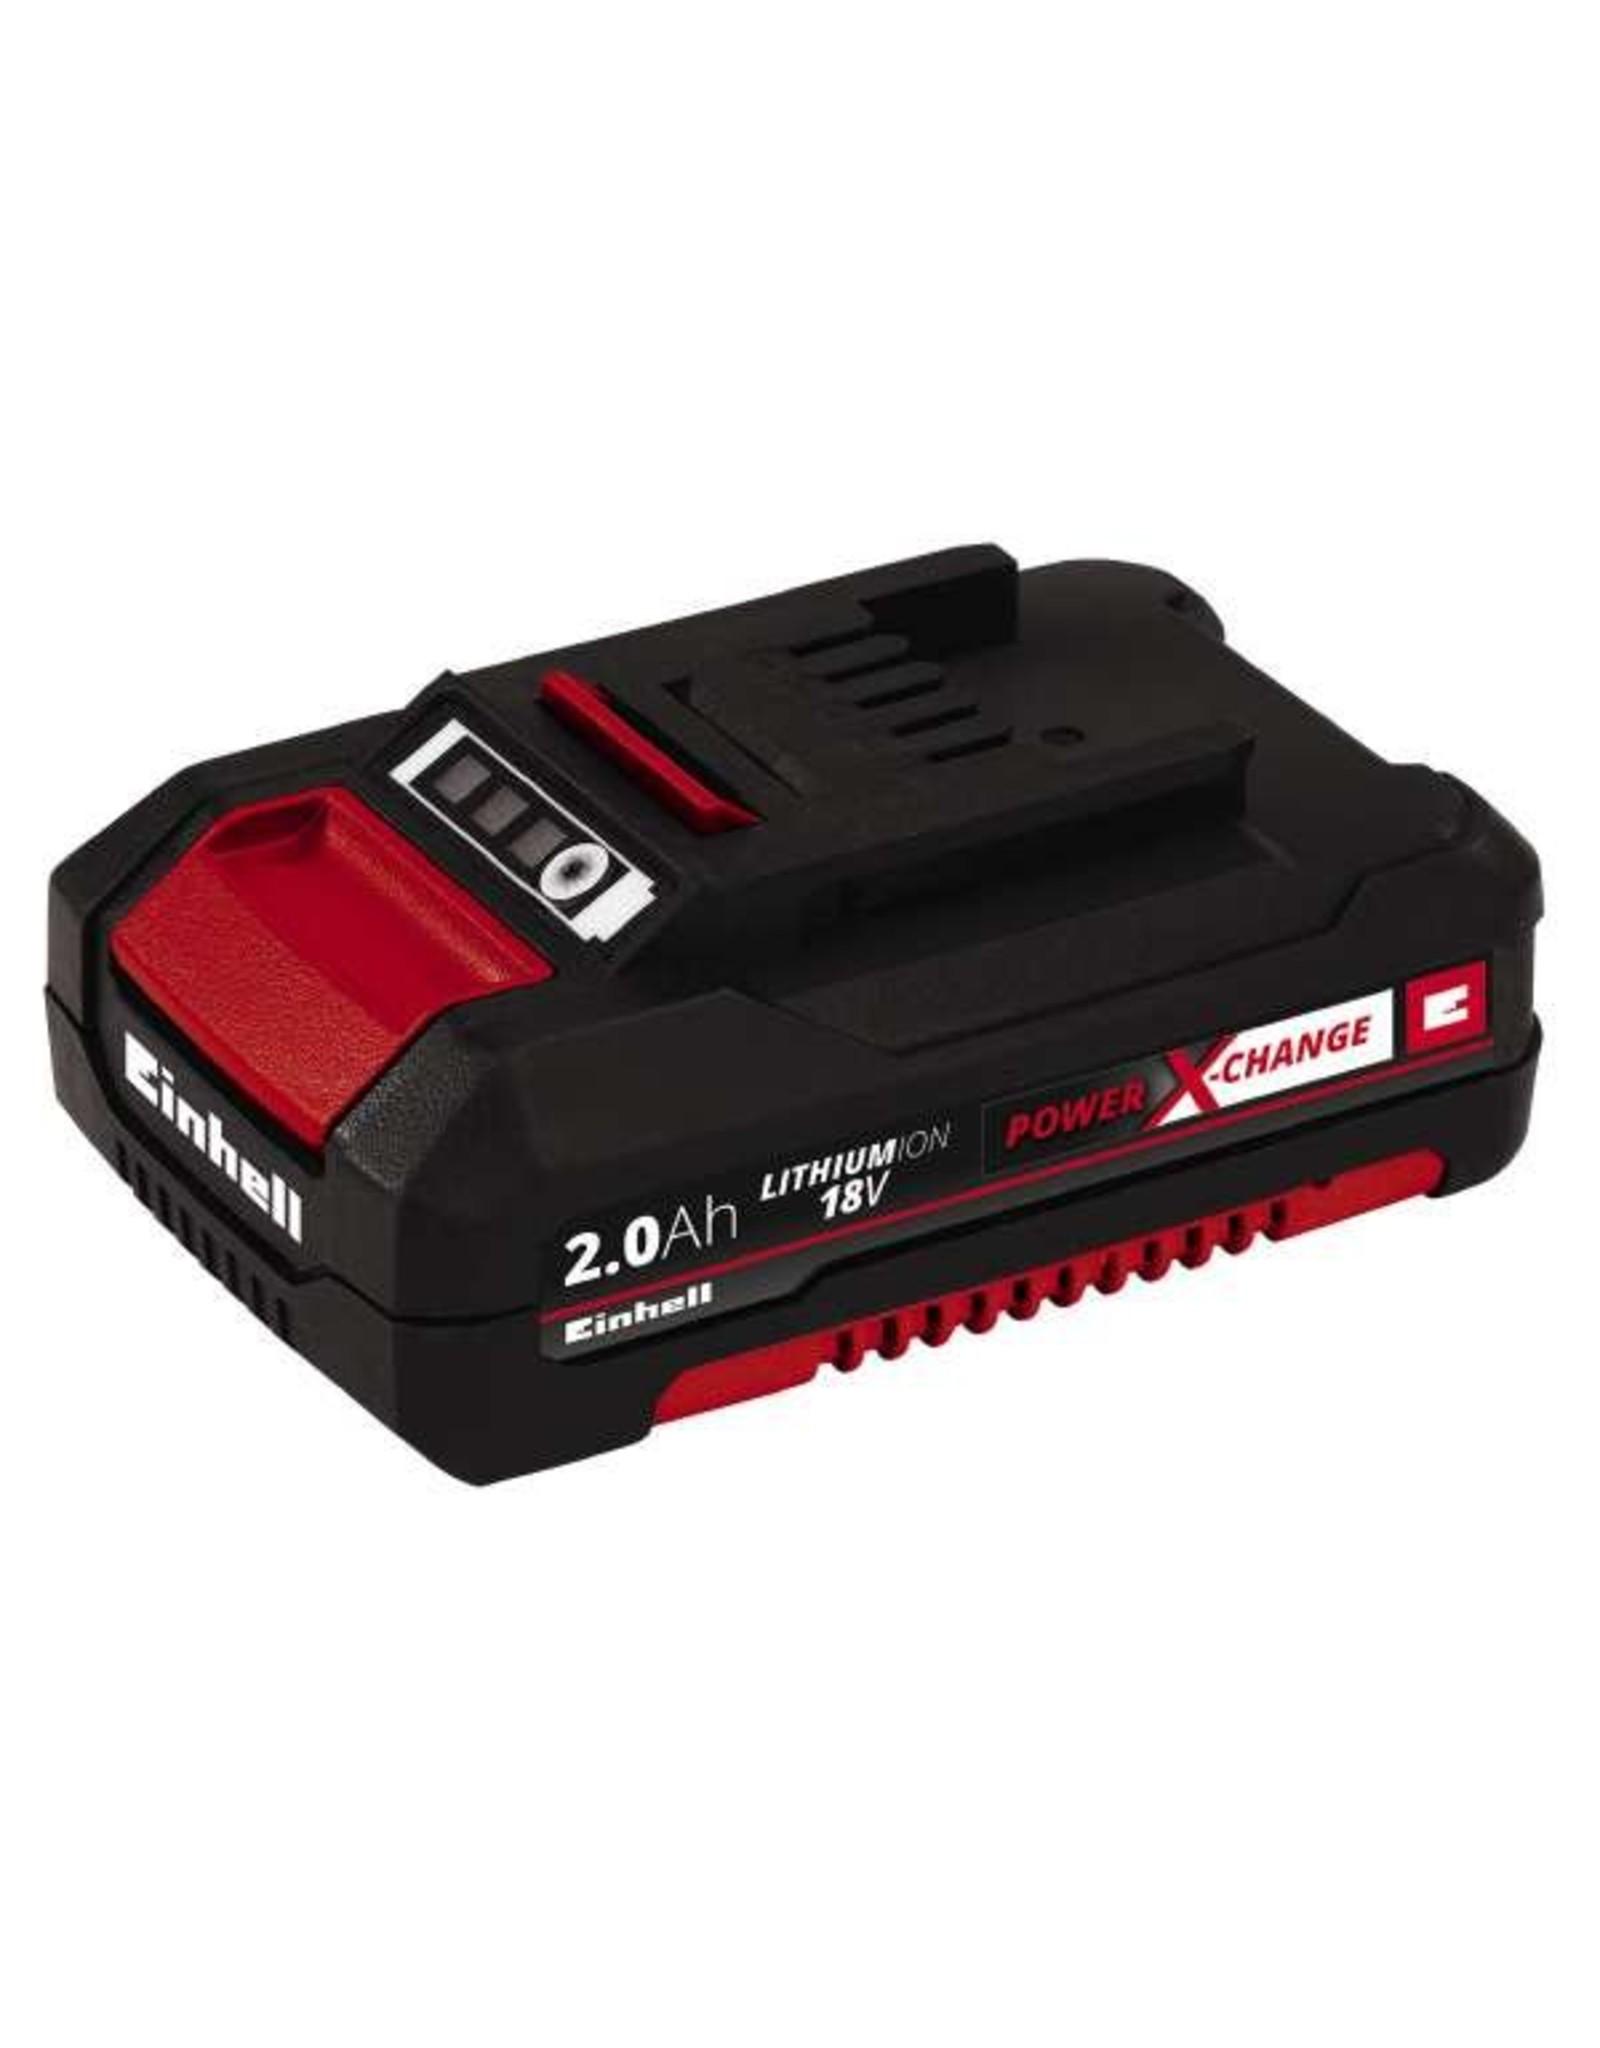 Einhell Einhell 4511395 Lithium-Ion oplaadbare batterij/accu